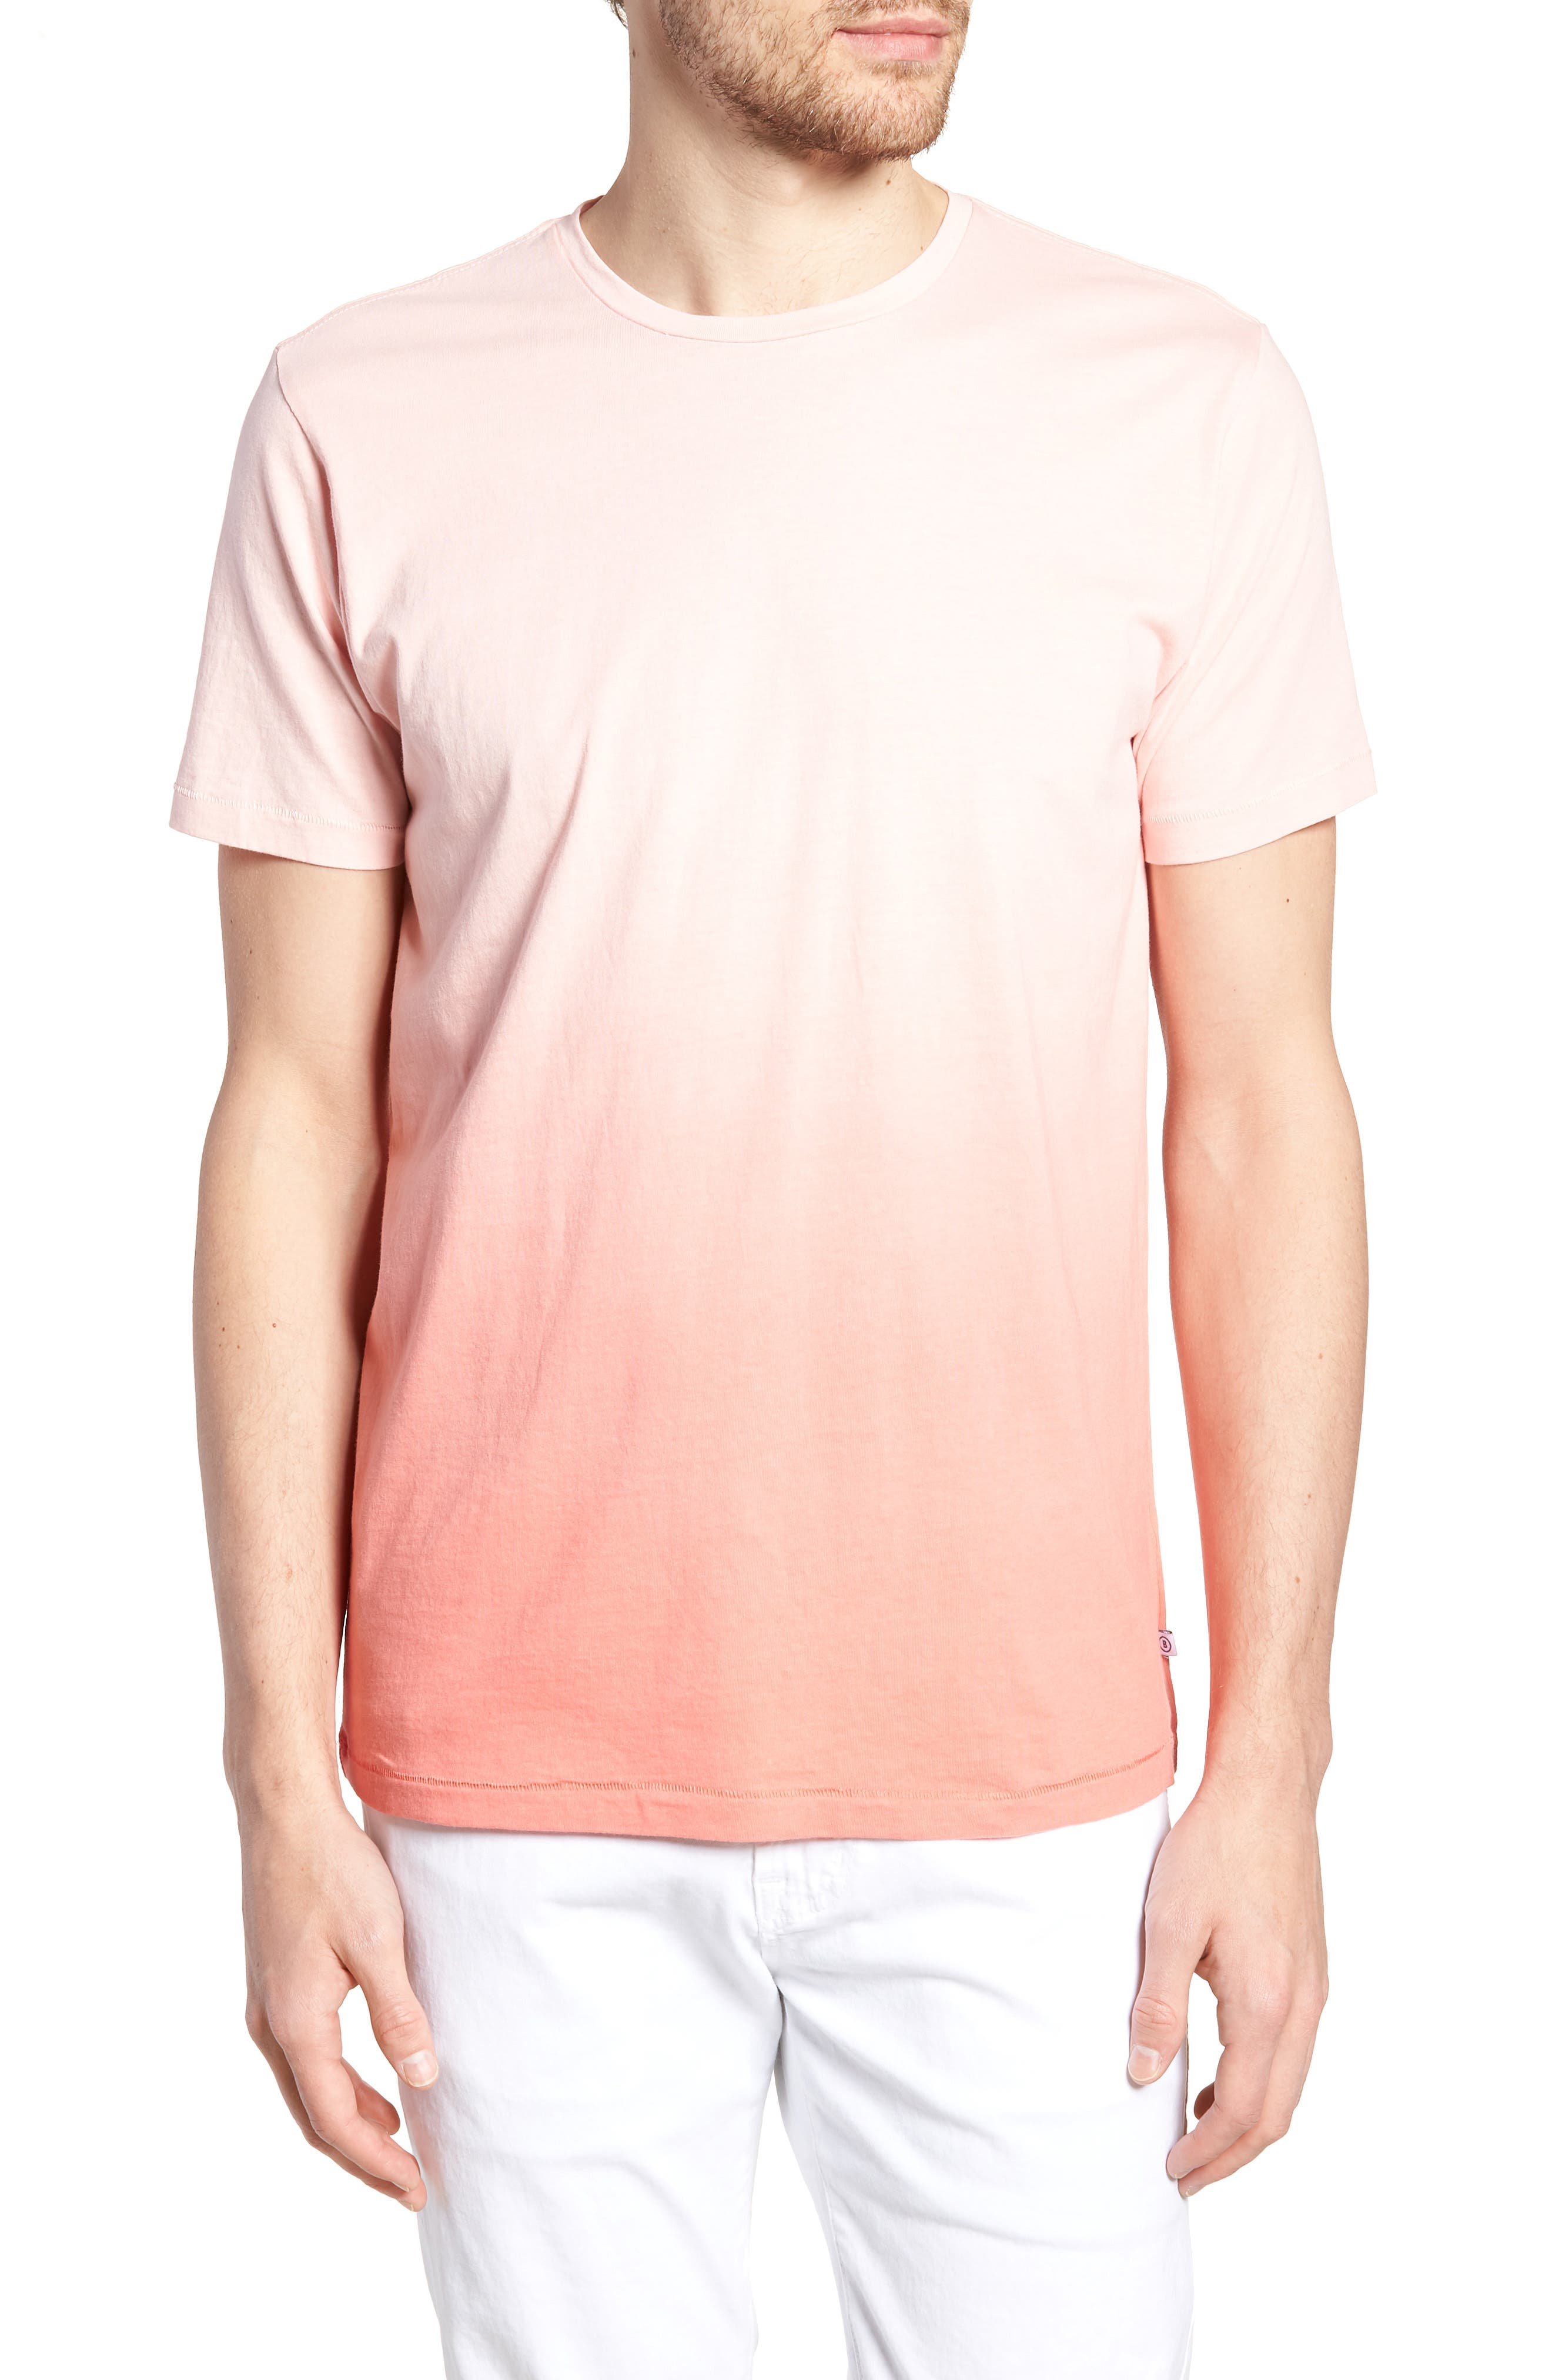 Main Image - Bonobos Dip Dye T-Shirt